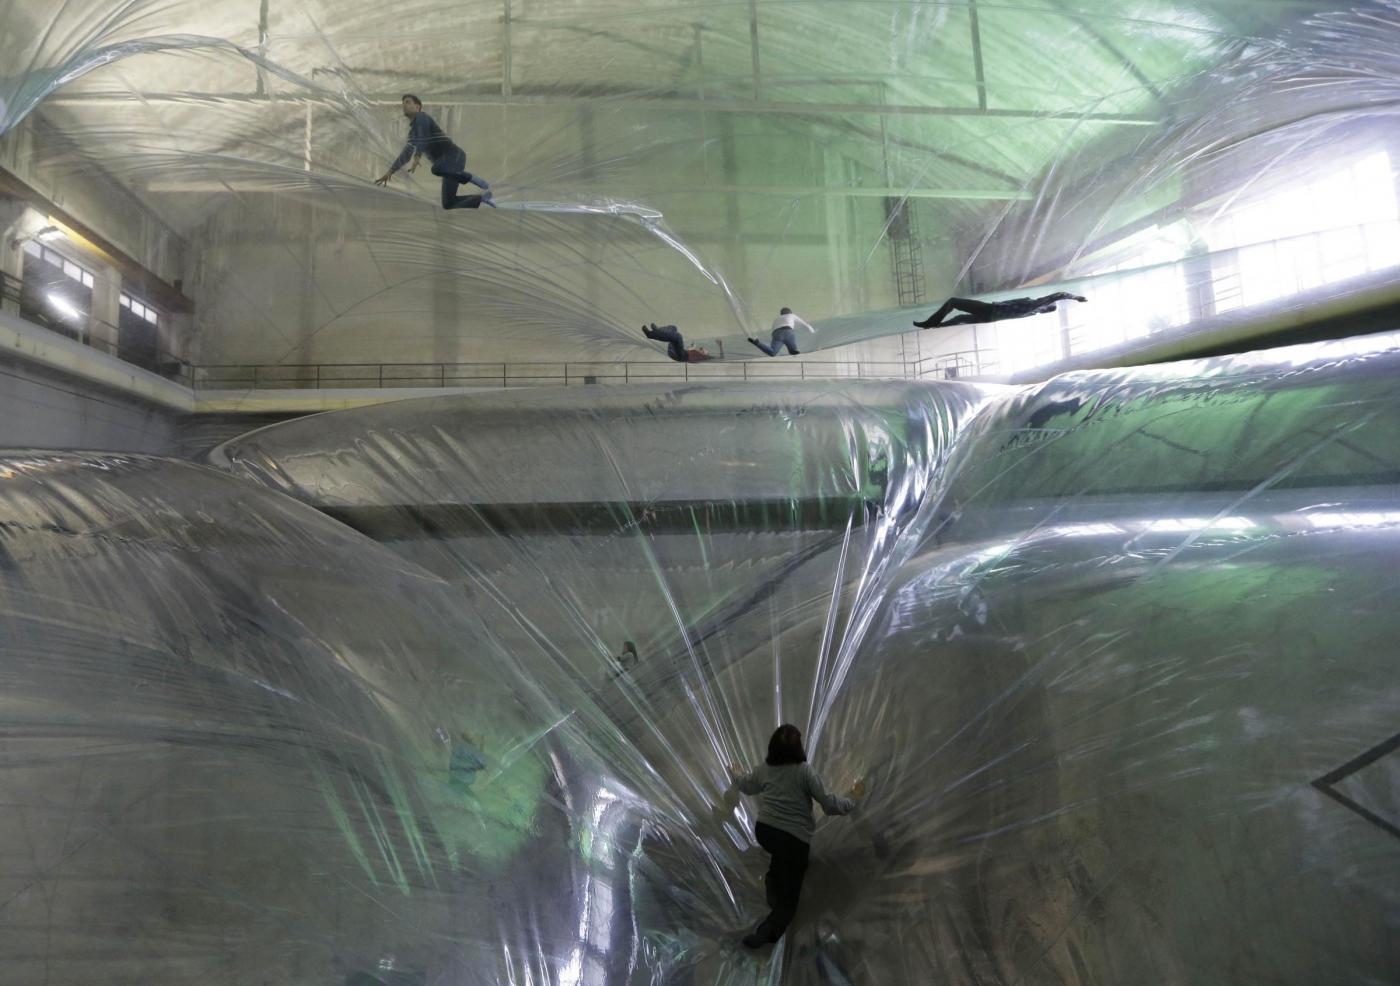 Milano, la bolla dell'artista argentino Tomás Saraceno04